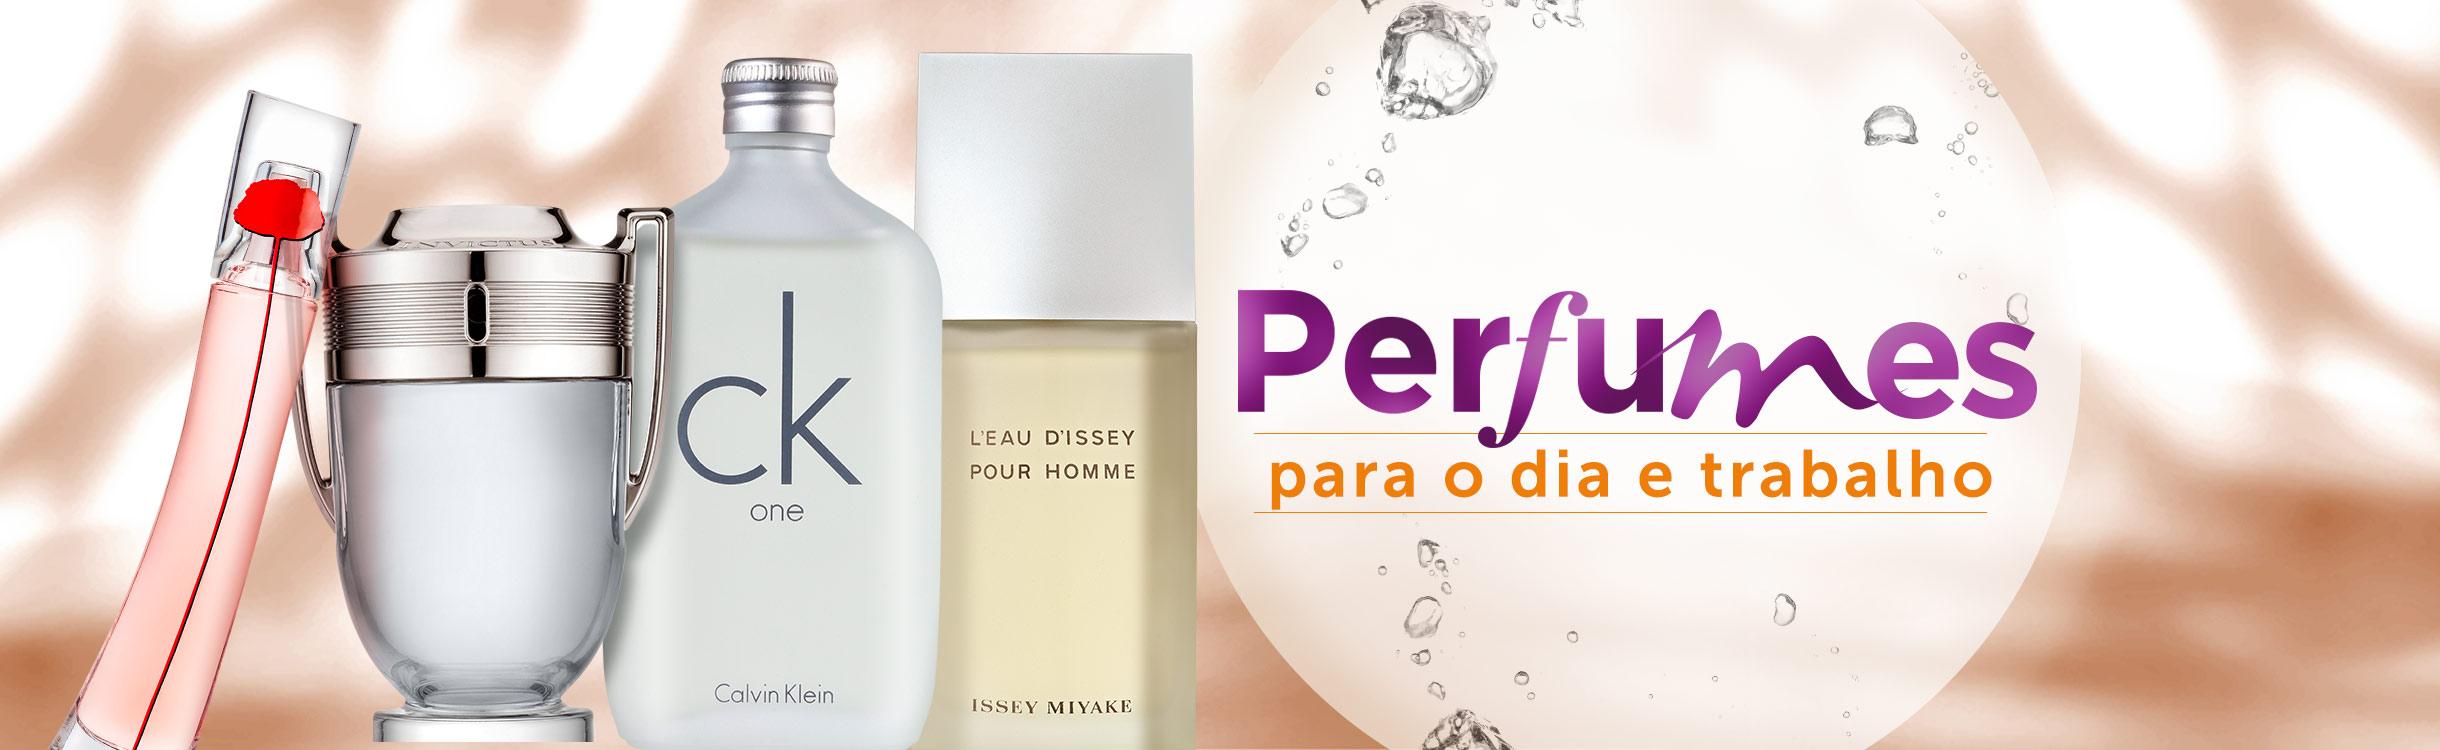 Perfumes para o trabalho